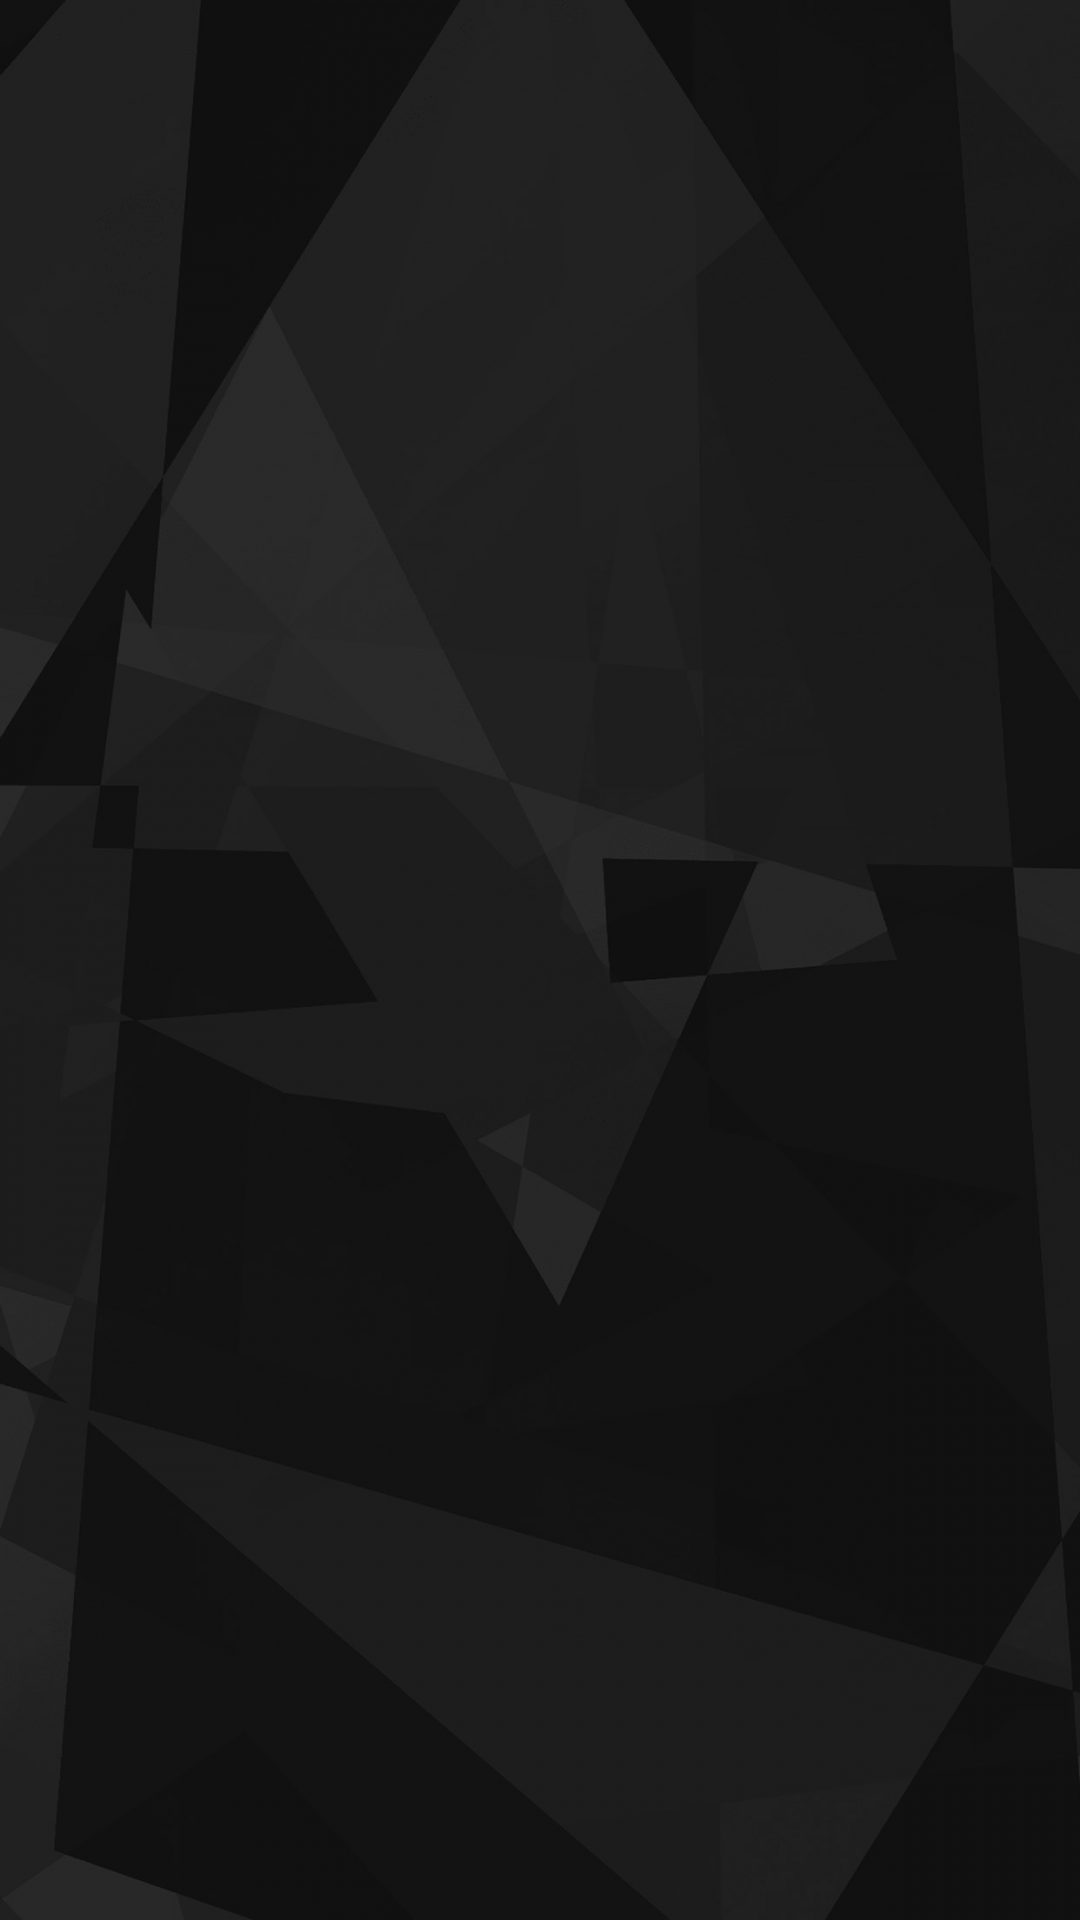 Abstract Polyart Dark Bw Pattern